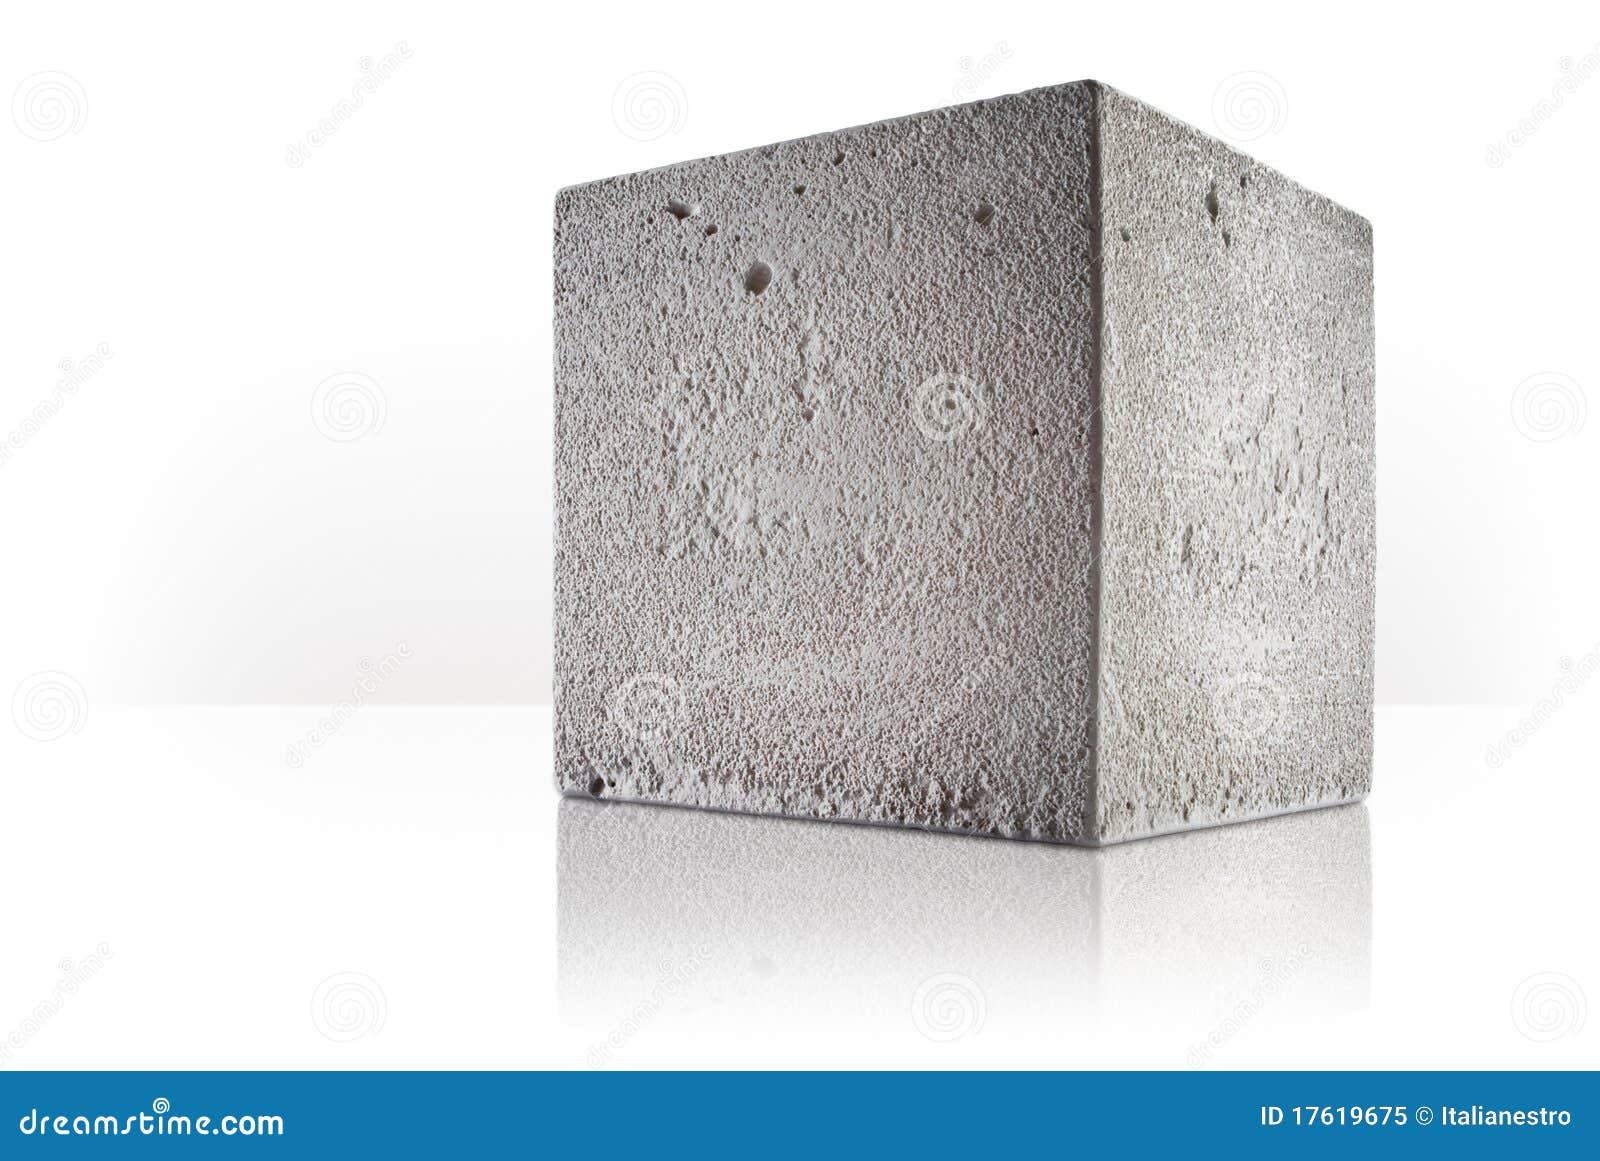 Konkret kub